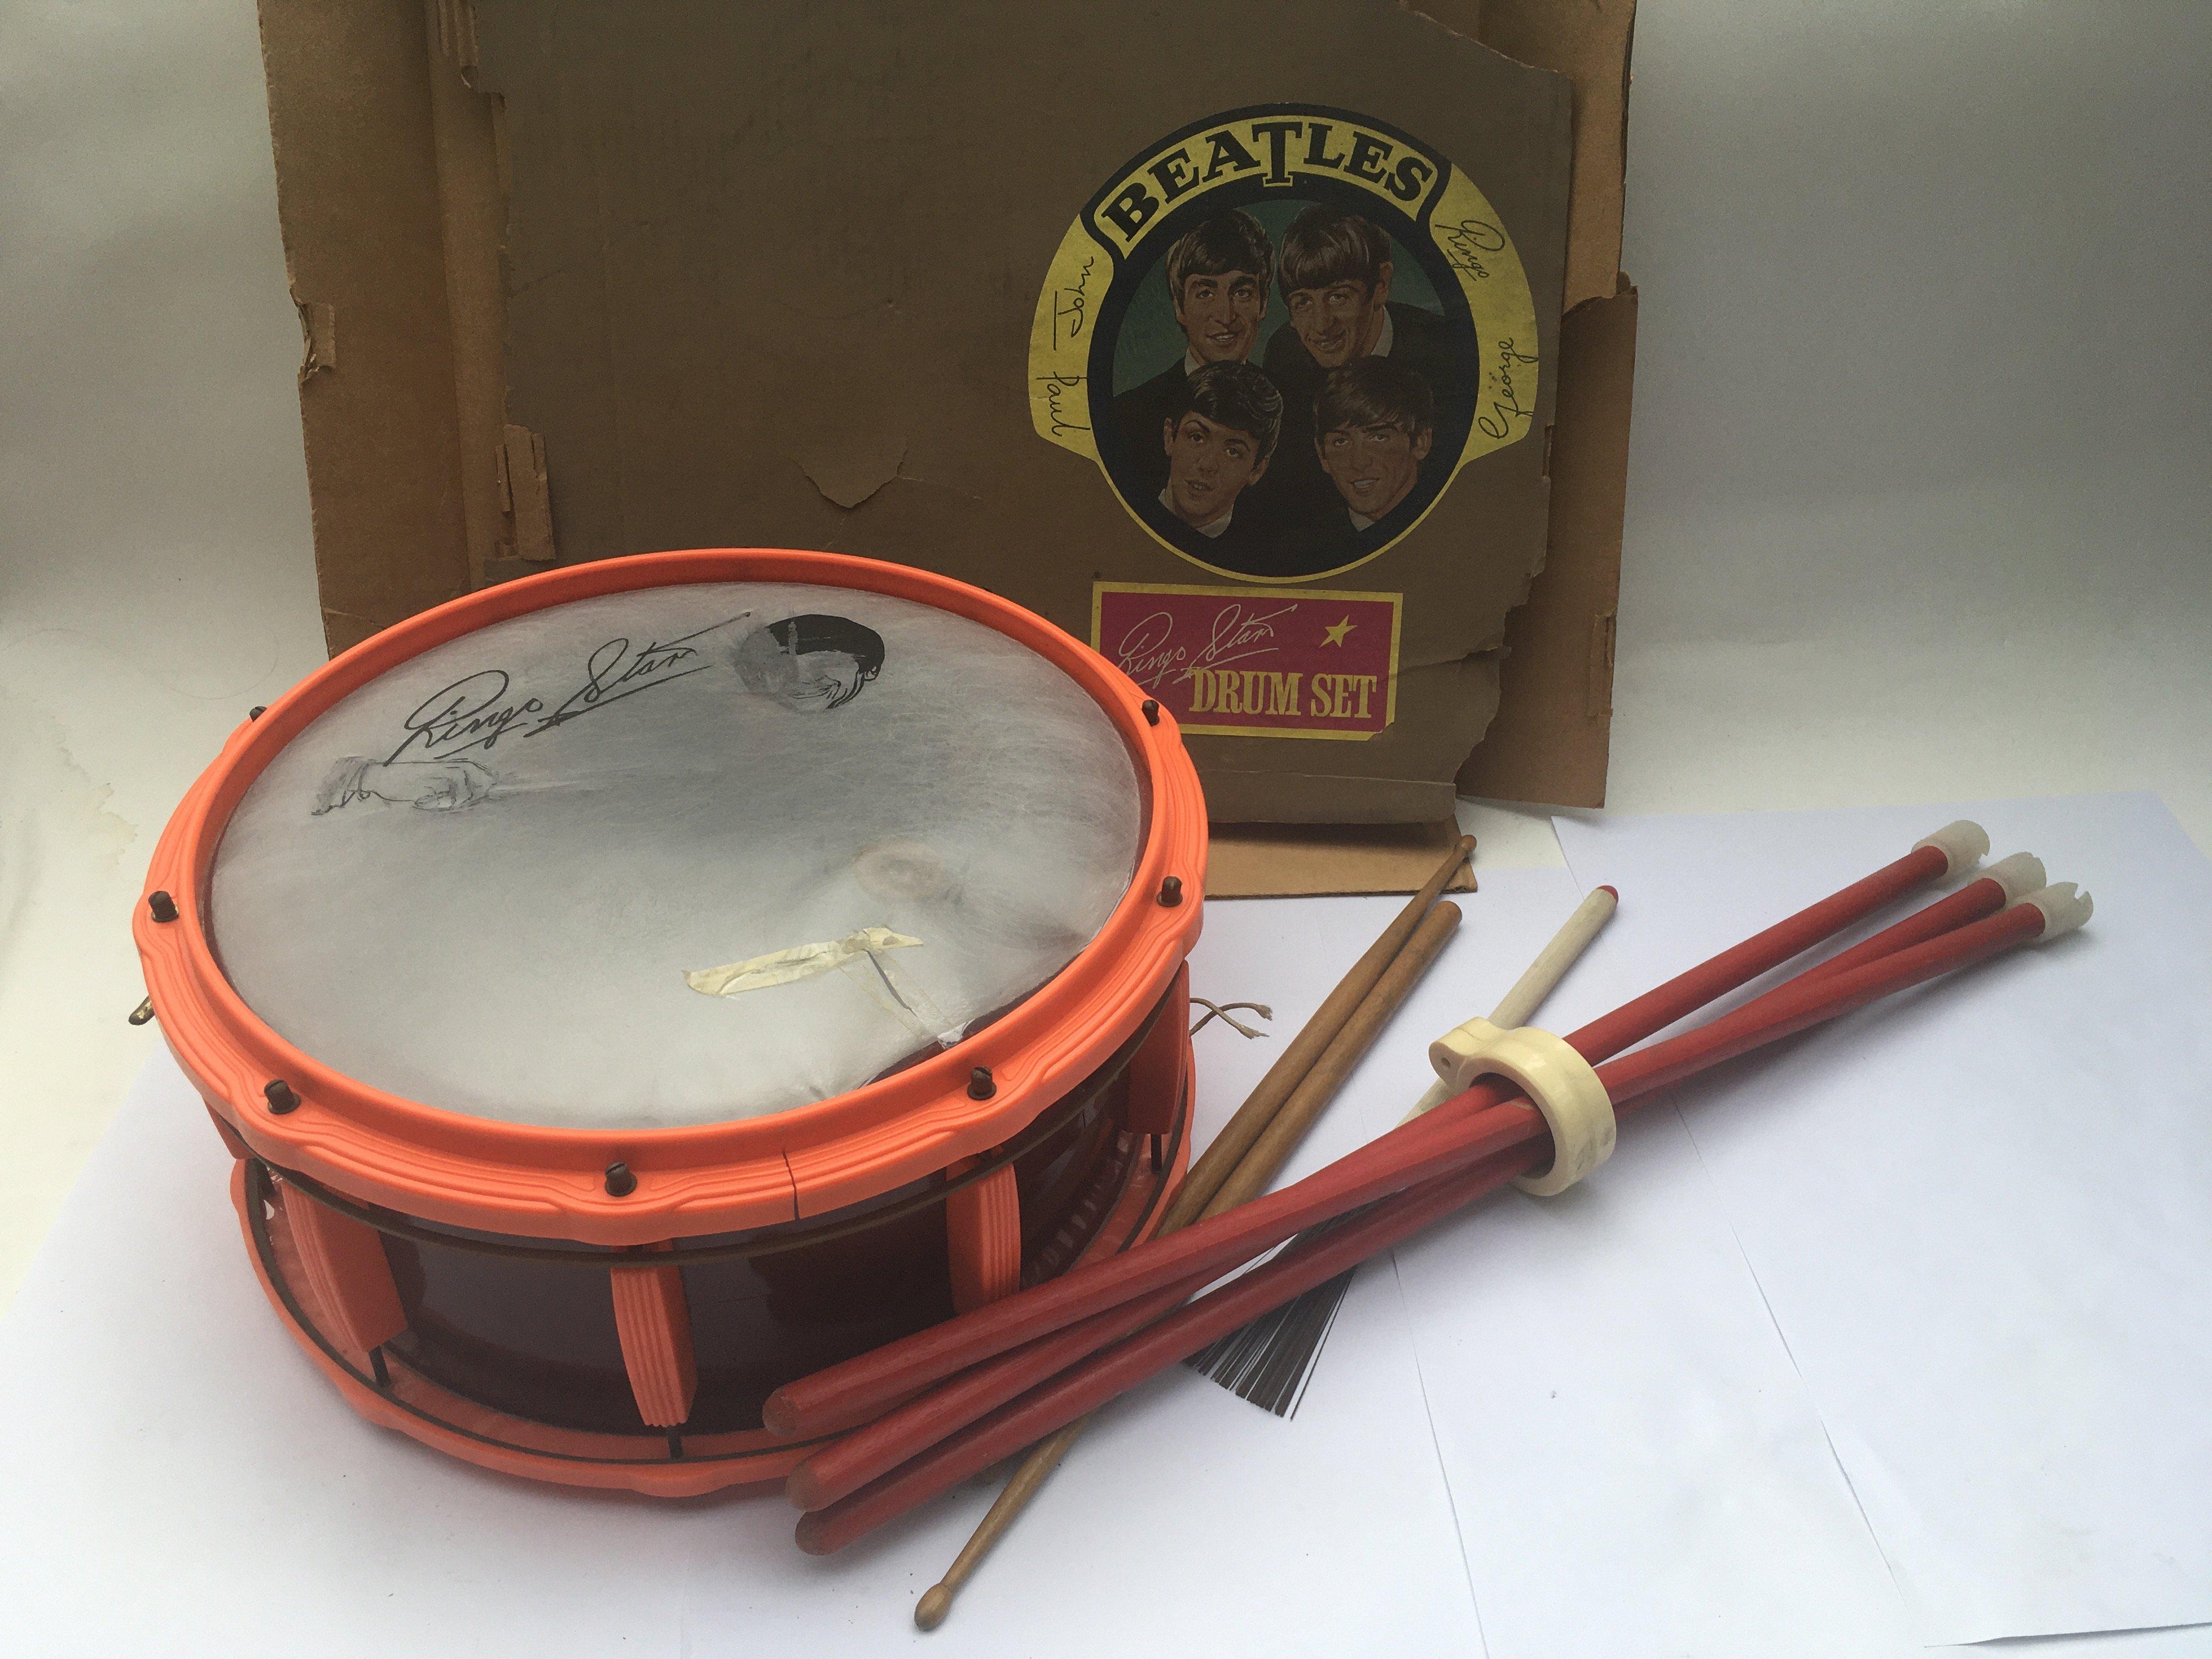 A Selcol New Beat Ringo Starr drum set.